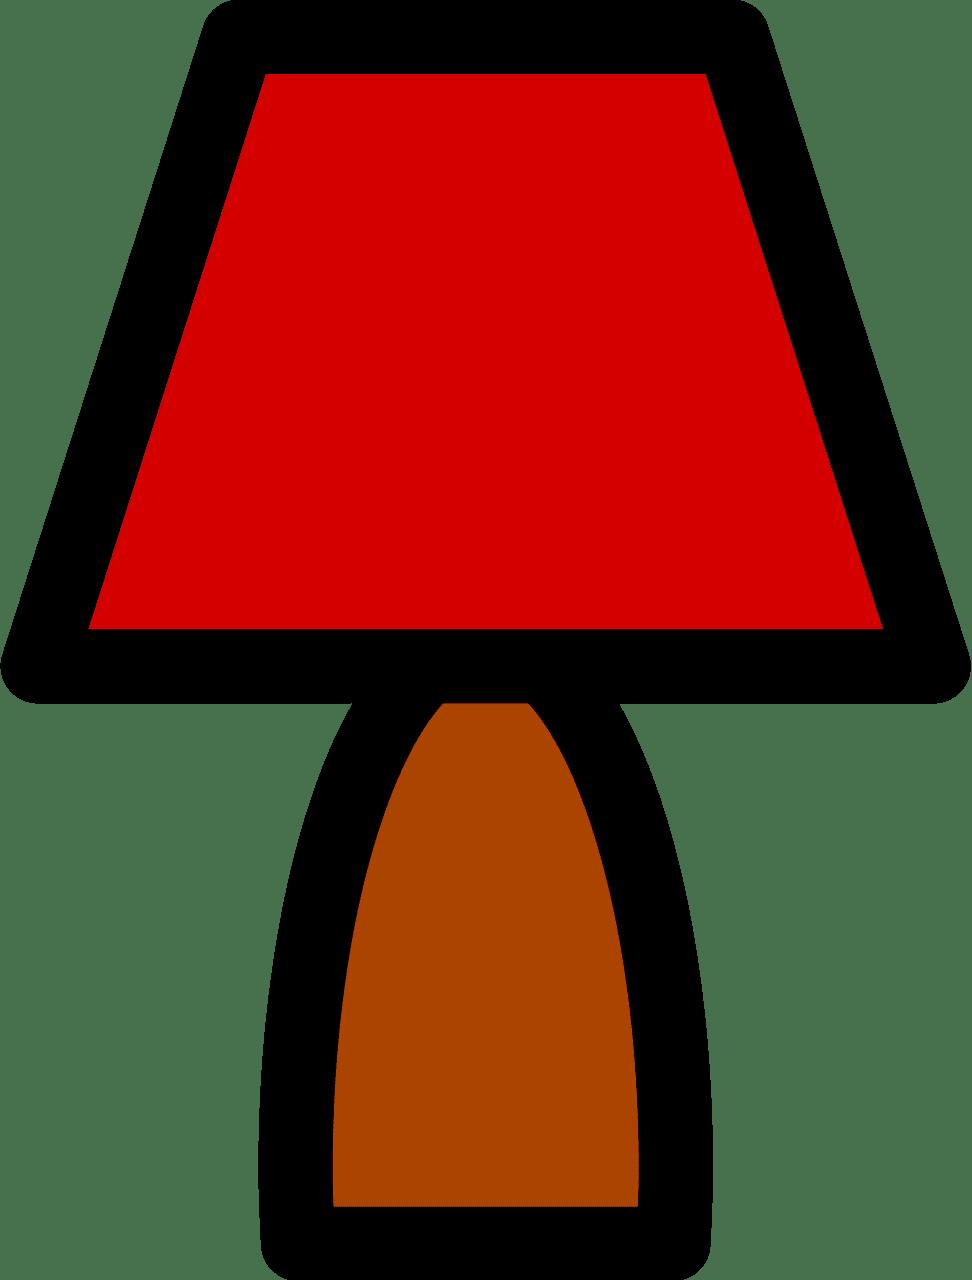 Lamp clipart transparent background 5